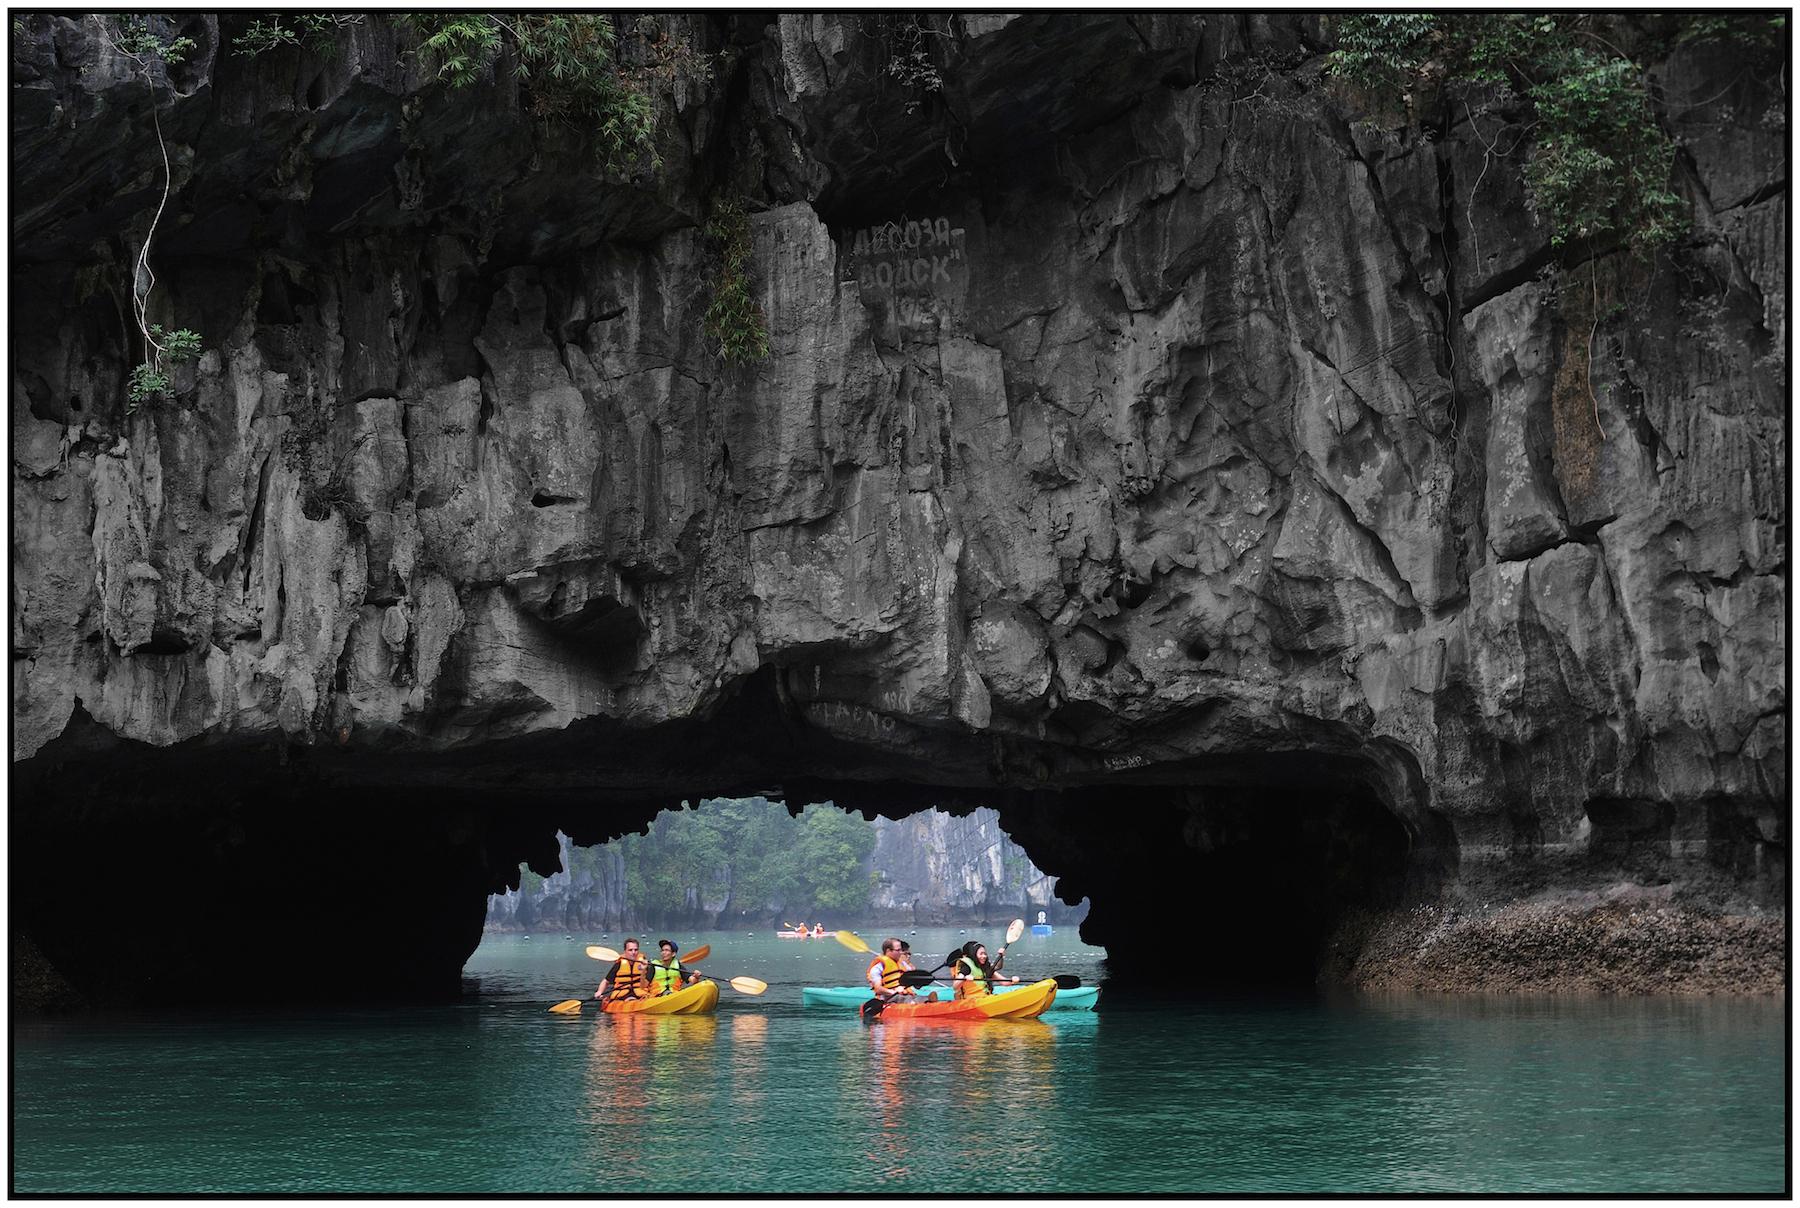 Ha Long Bay, Hang Luon (Luon Cave), limestone karst with open-air center, near Hanoi, Feb 2015. #4146